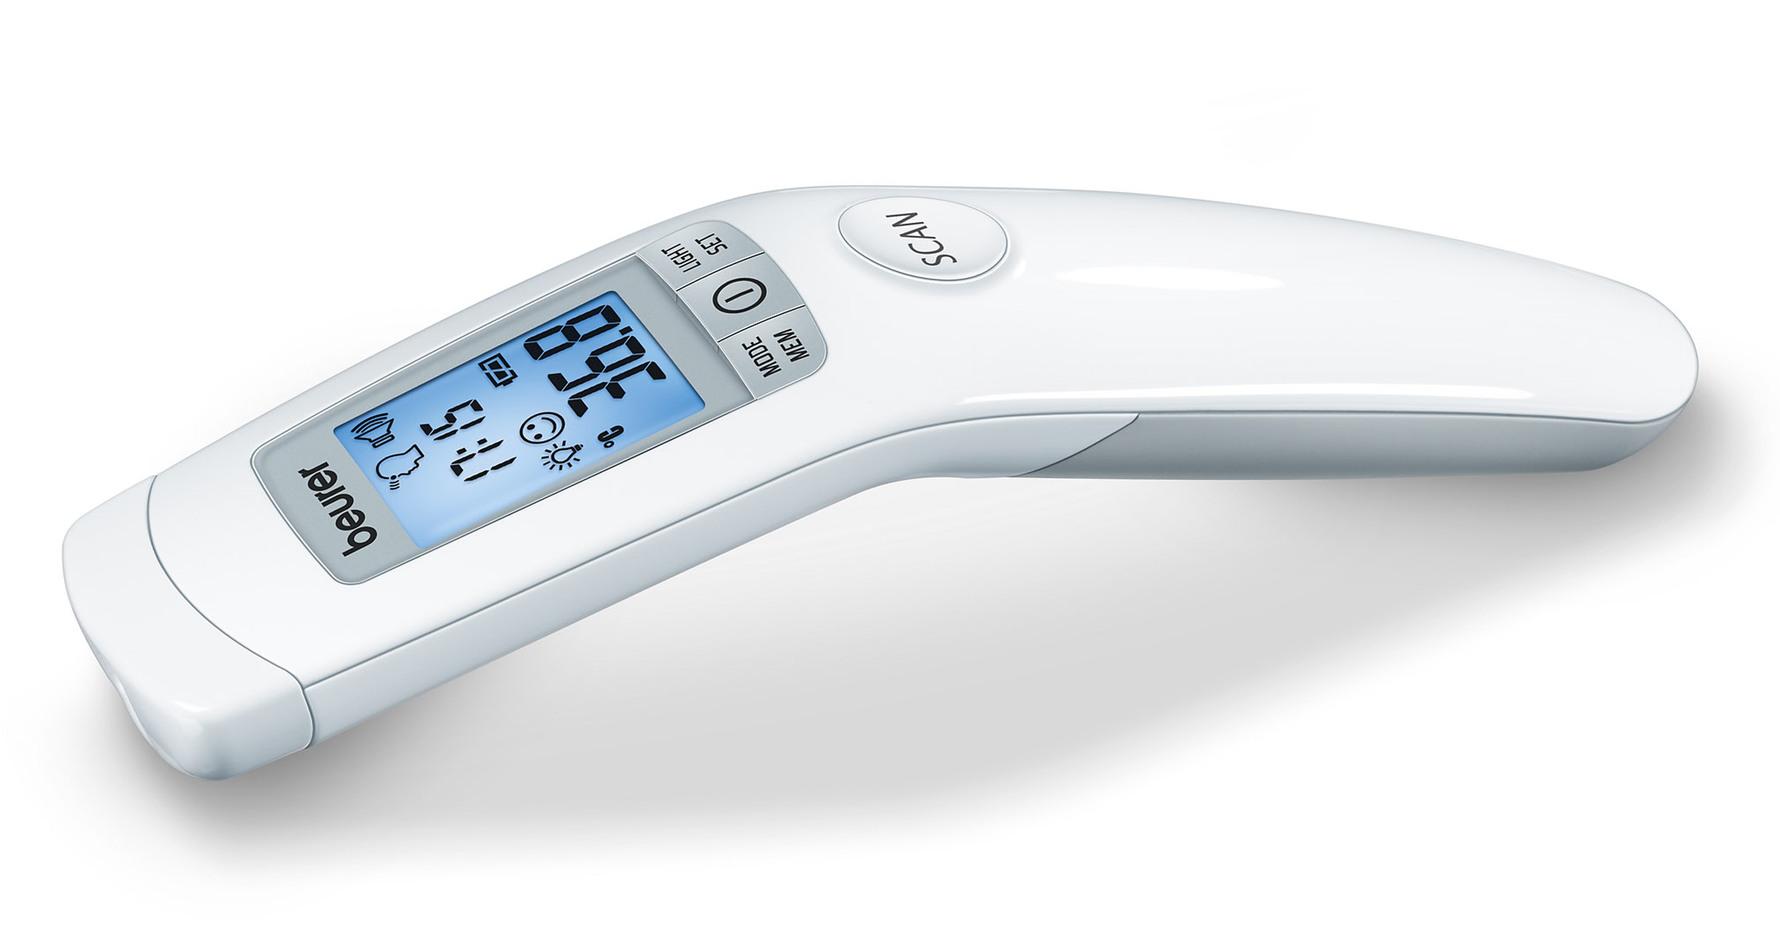 Termometer apotek dea8c88d59fc8